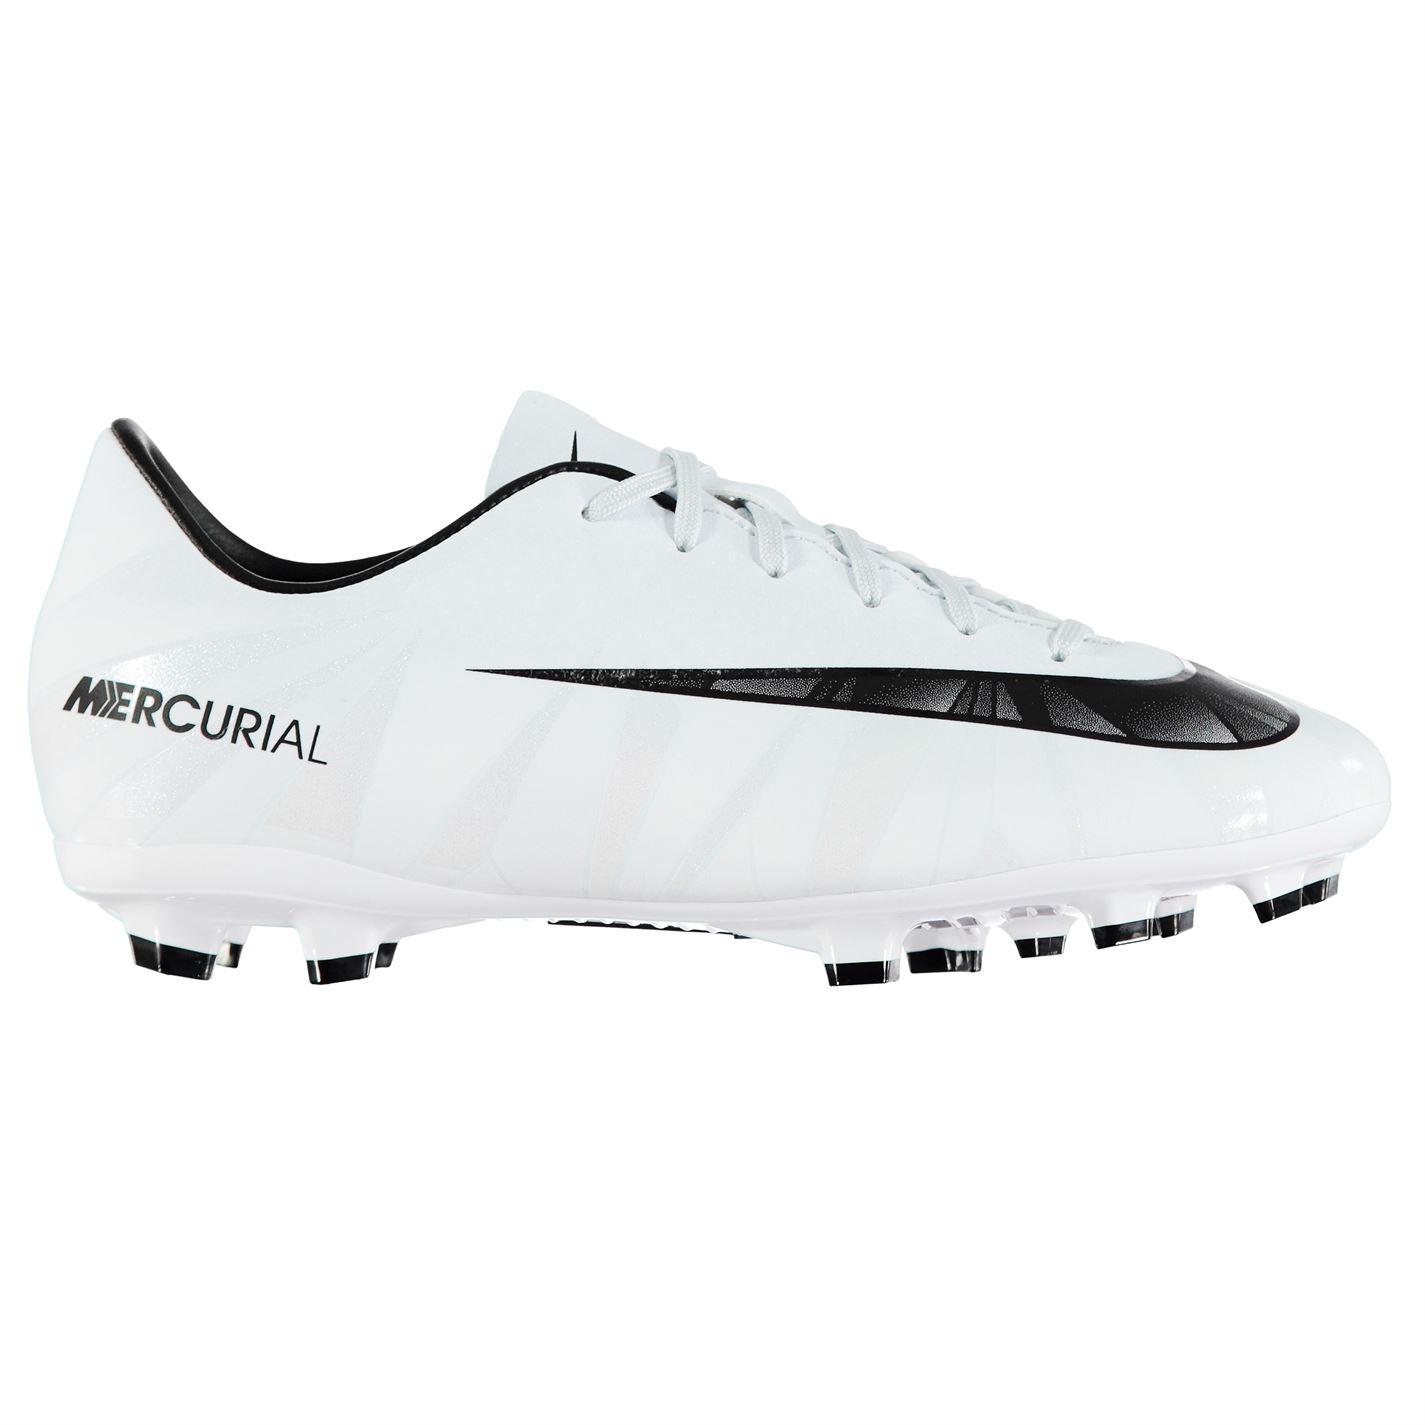 Nike Mercurial Victory CR7 FG Junior Football Boots